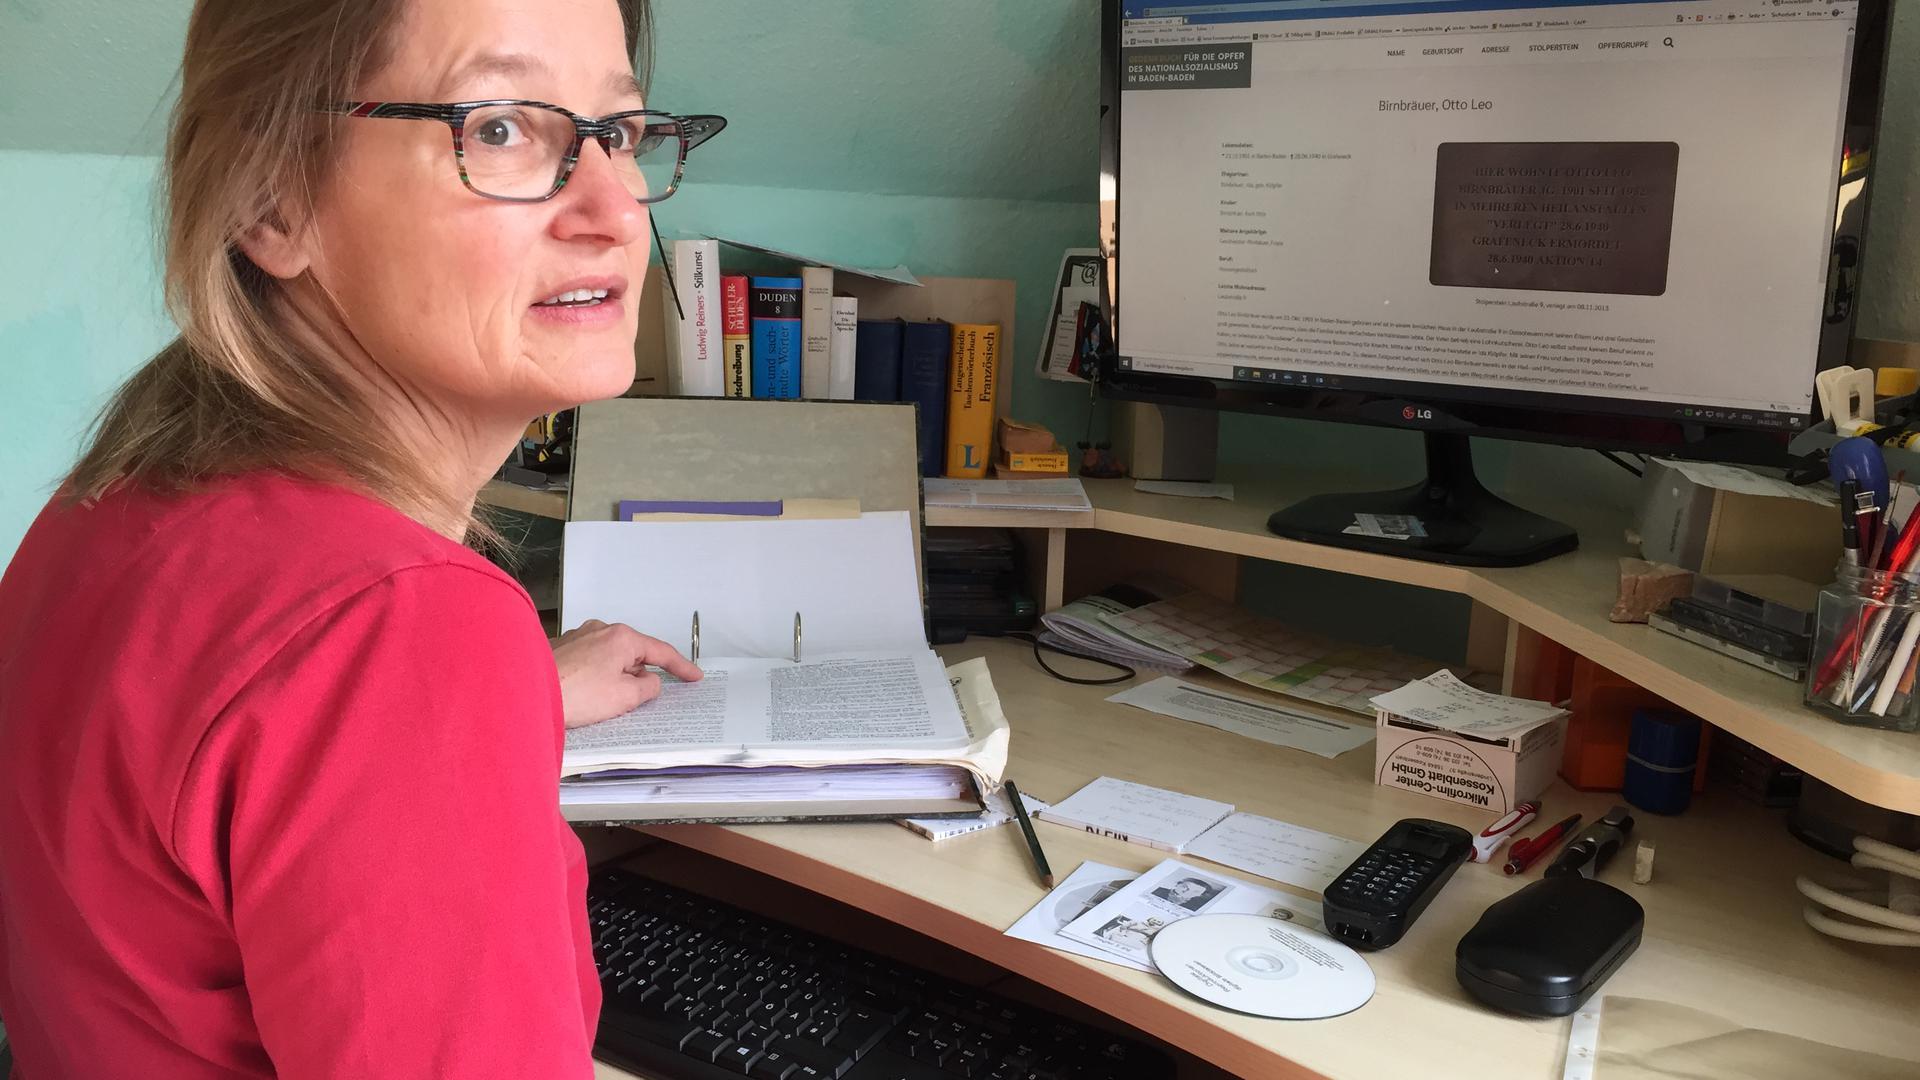 Dagmar Rumpf leistet im Augenblick viel Arbeit am Computer